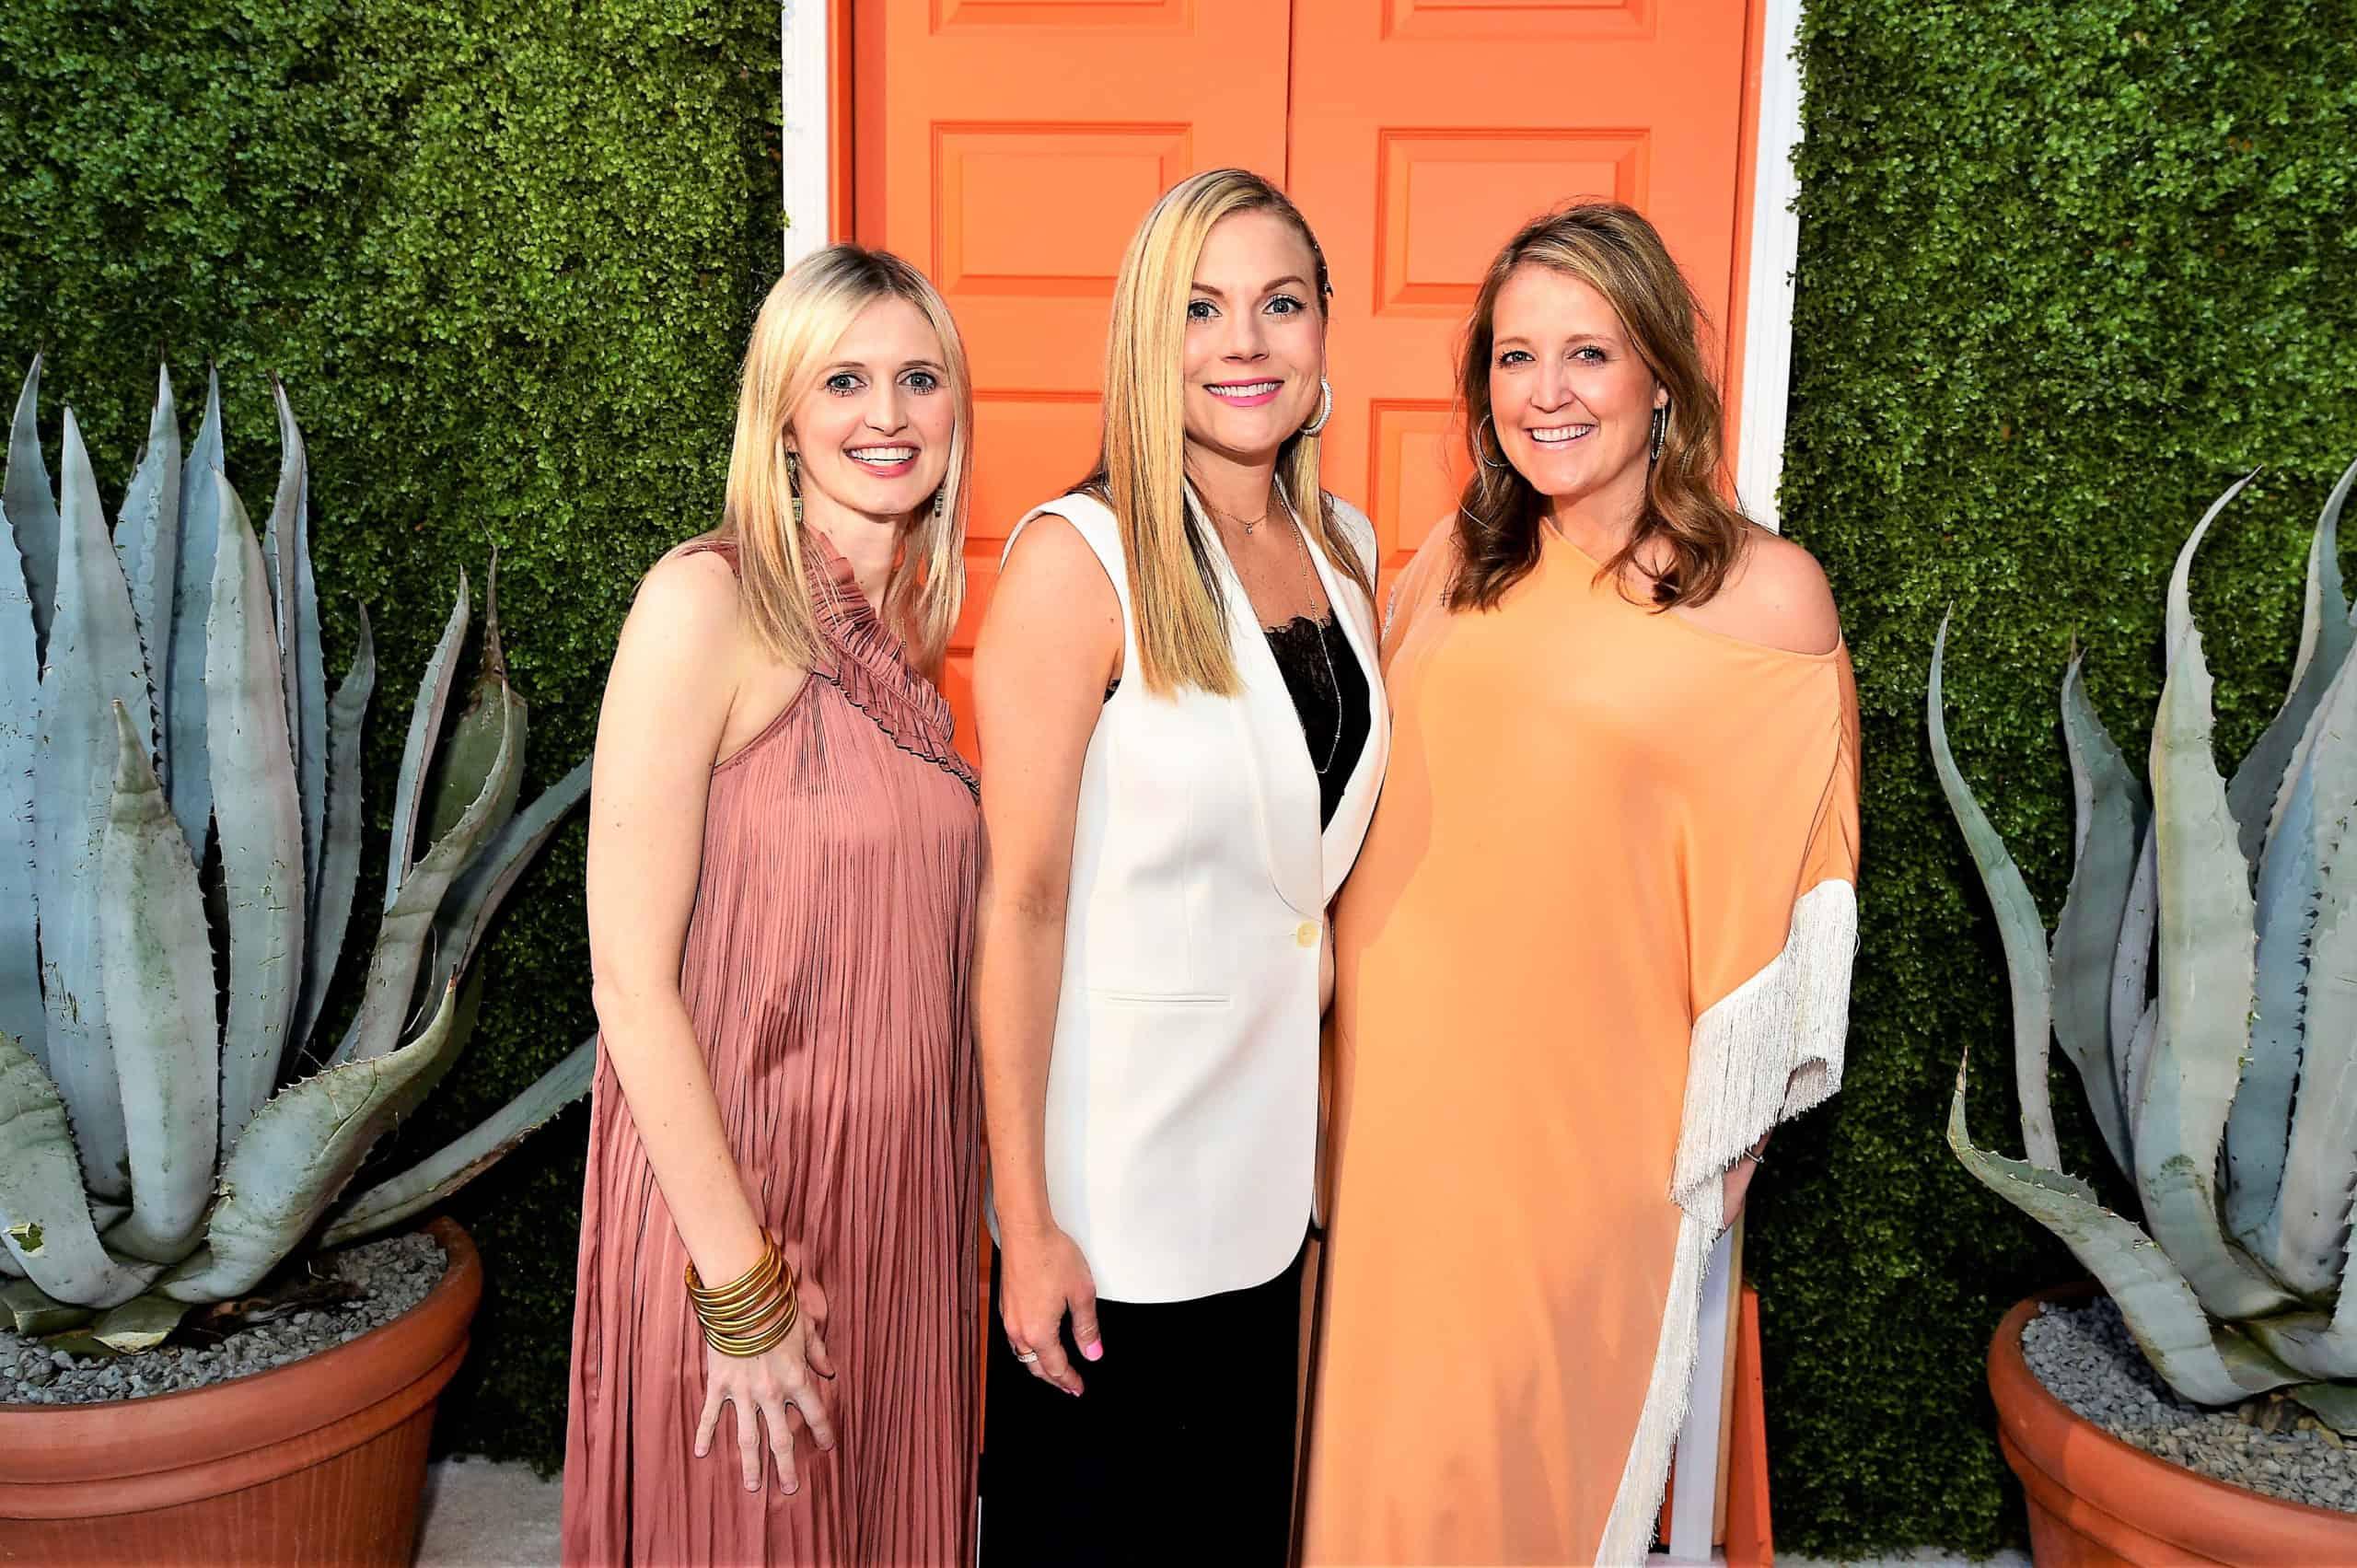 Stacy Hoyt, Stephanie Bailey and Elizabeth Marceau